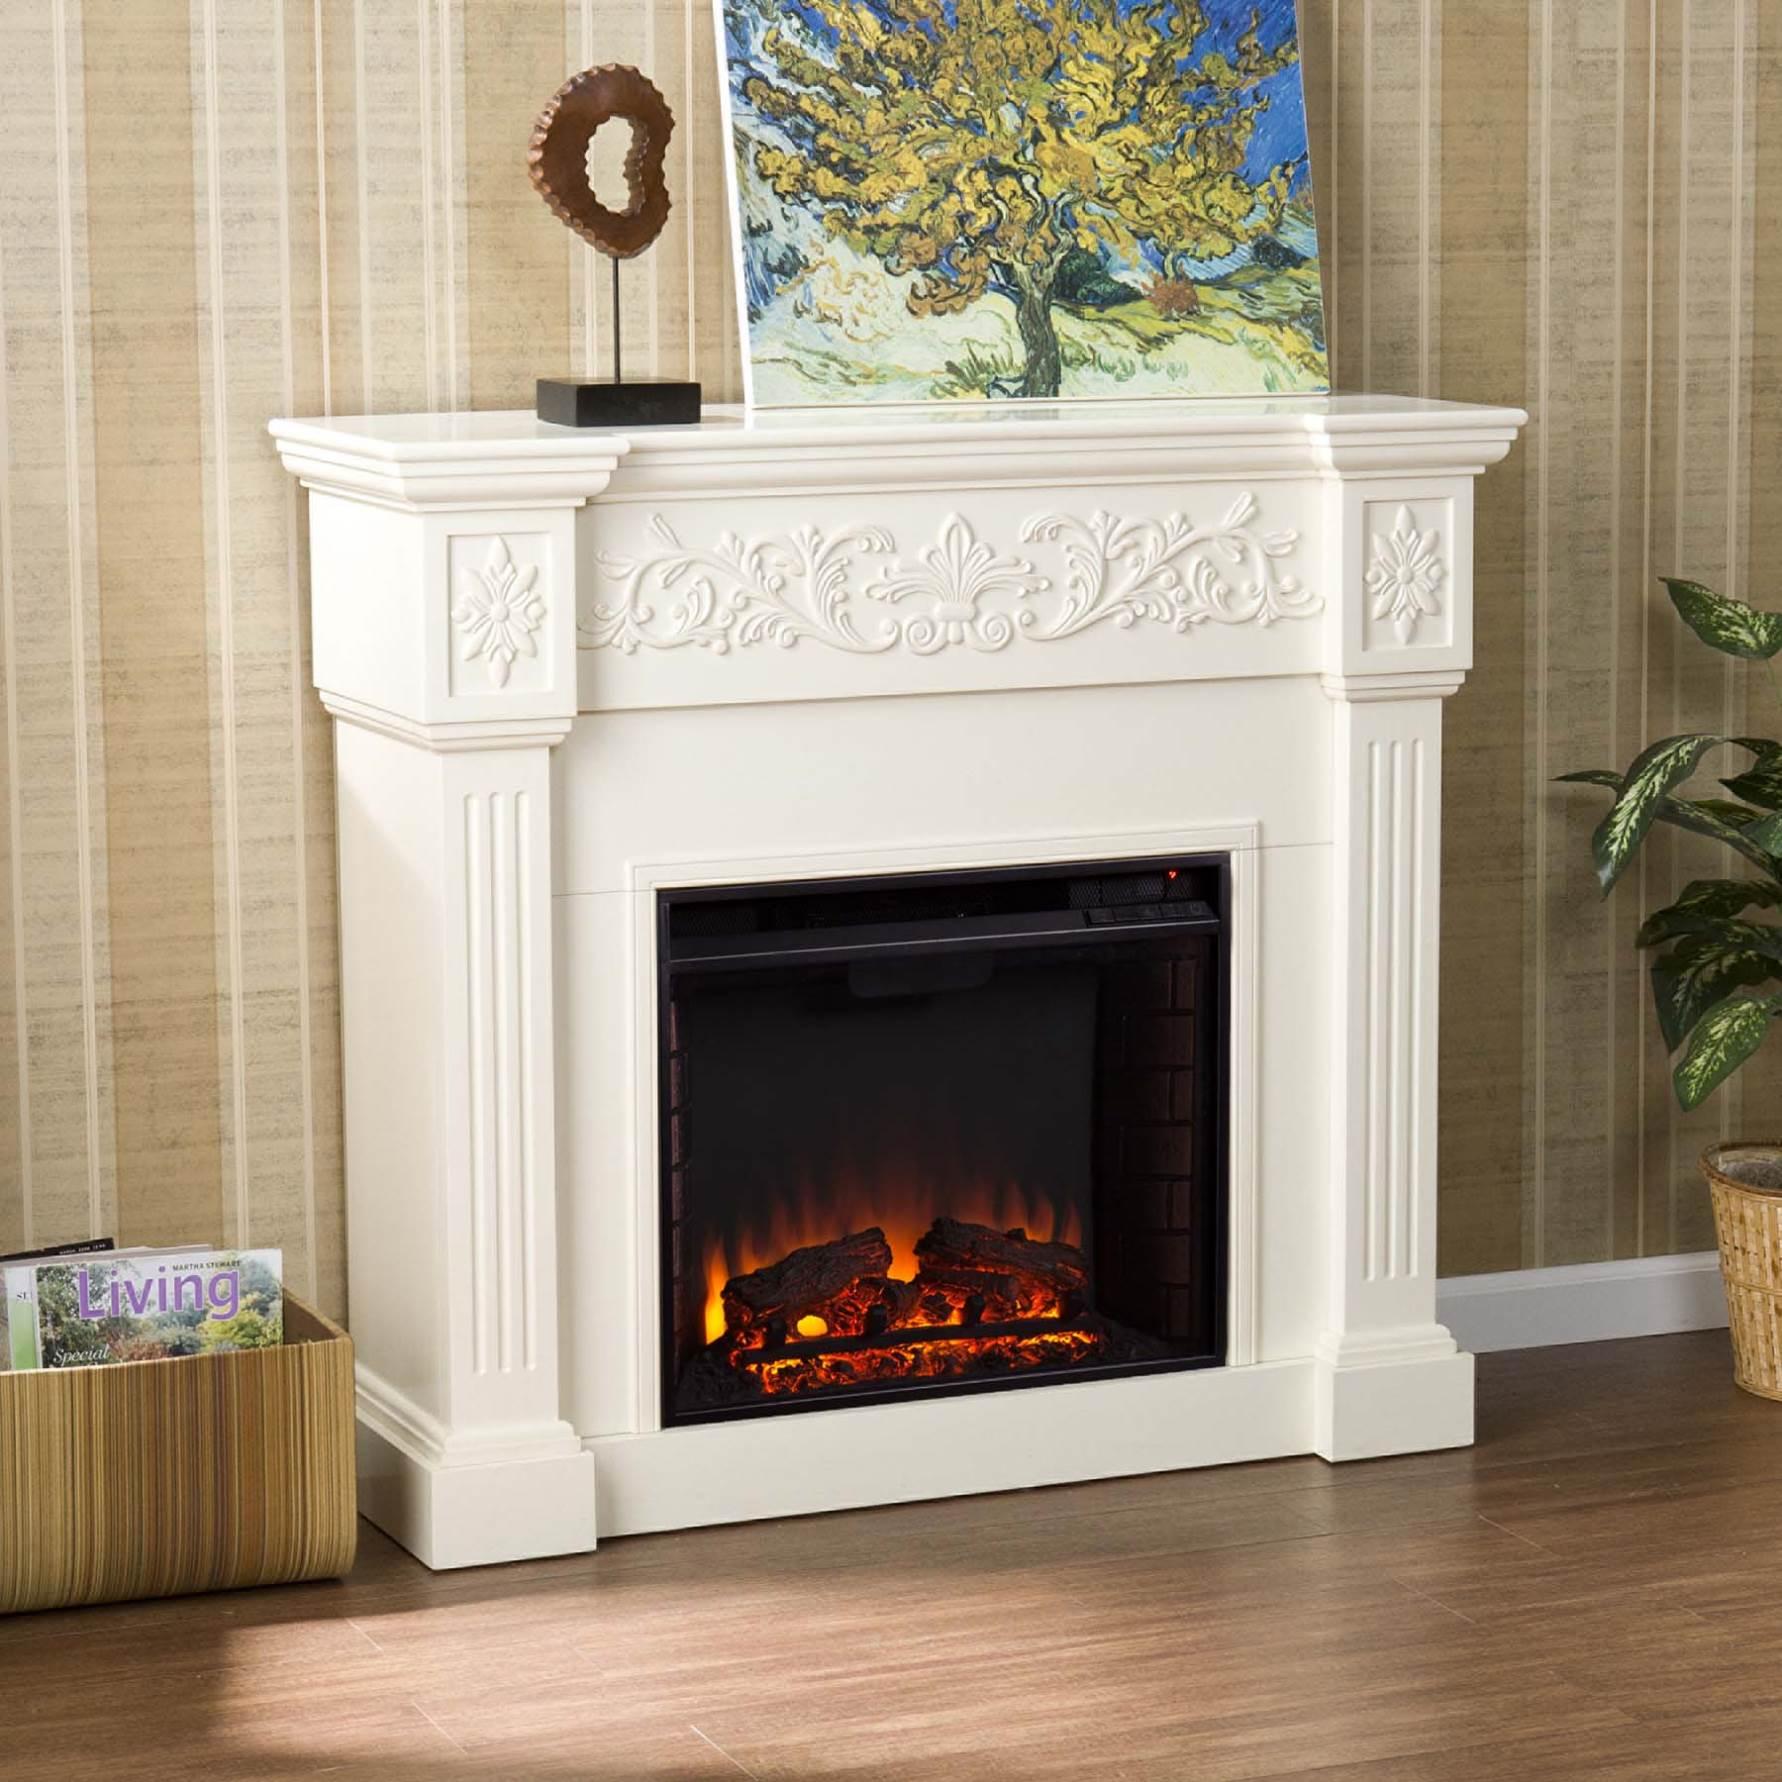 costco winsome white stand depot home lots lowes gas tar corner fireplace bo lumina electric sinclair inch gray big sorenson menards